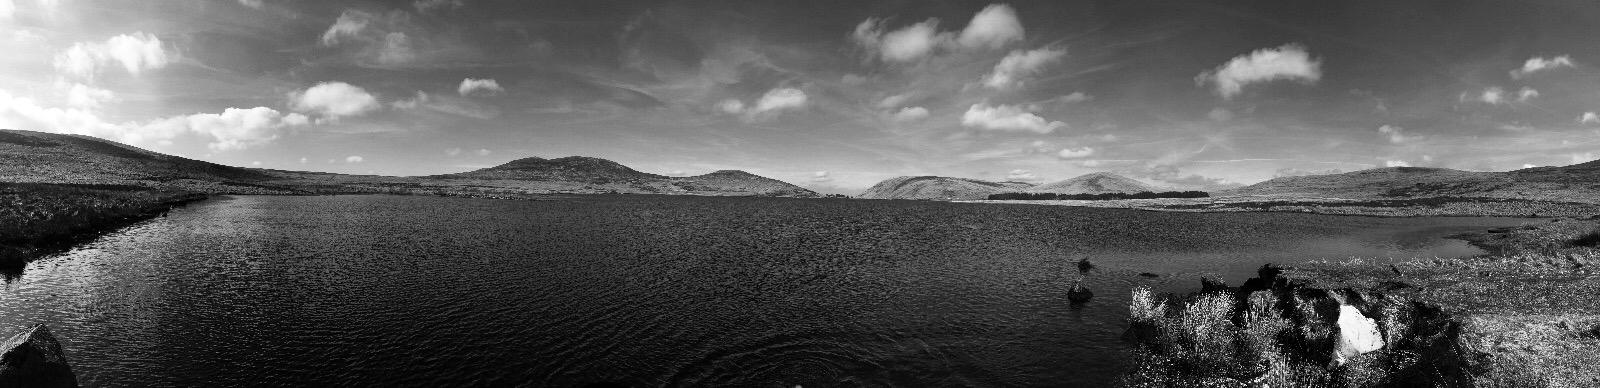 black_and_white_panoramic_spelga_damn_mourne_mountains_ni_explorer_niexplorer_northern_ireland_blog.jpg